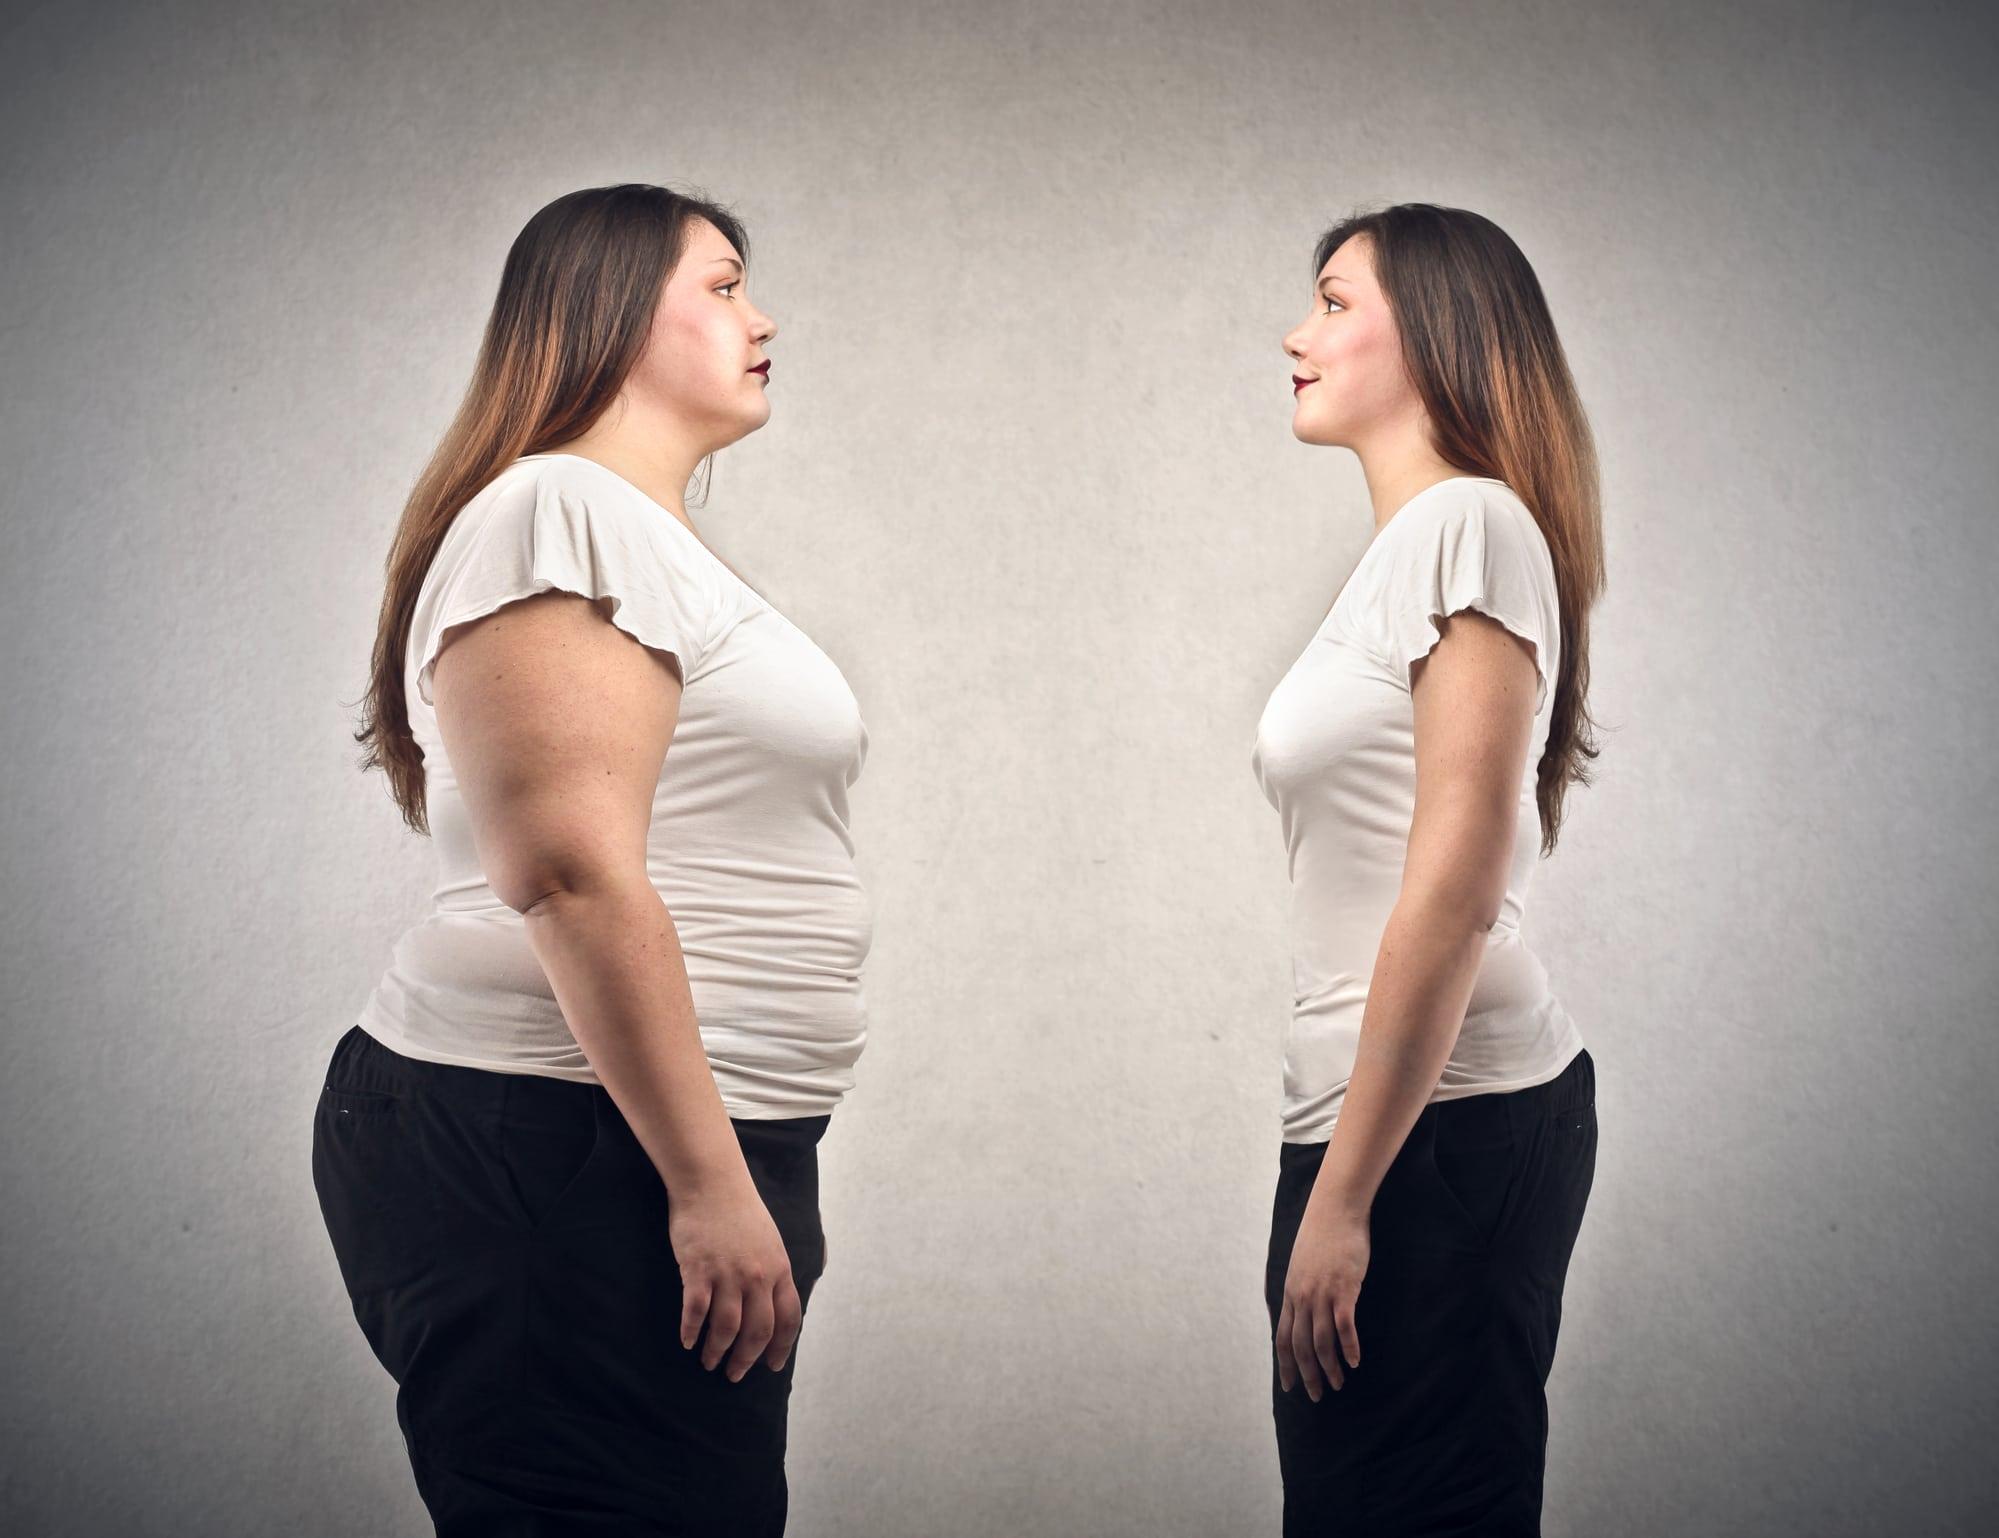 weight gain through lack of sleep